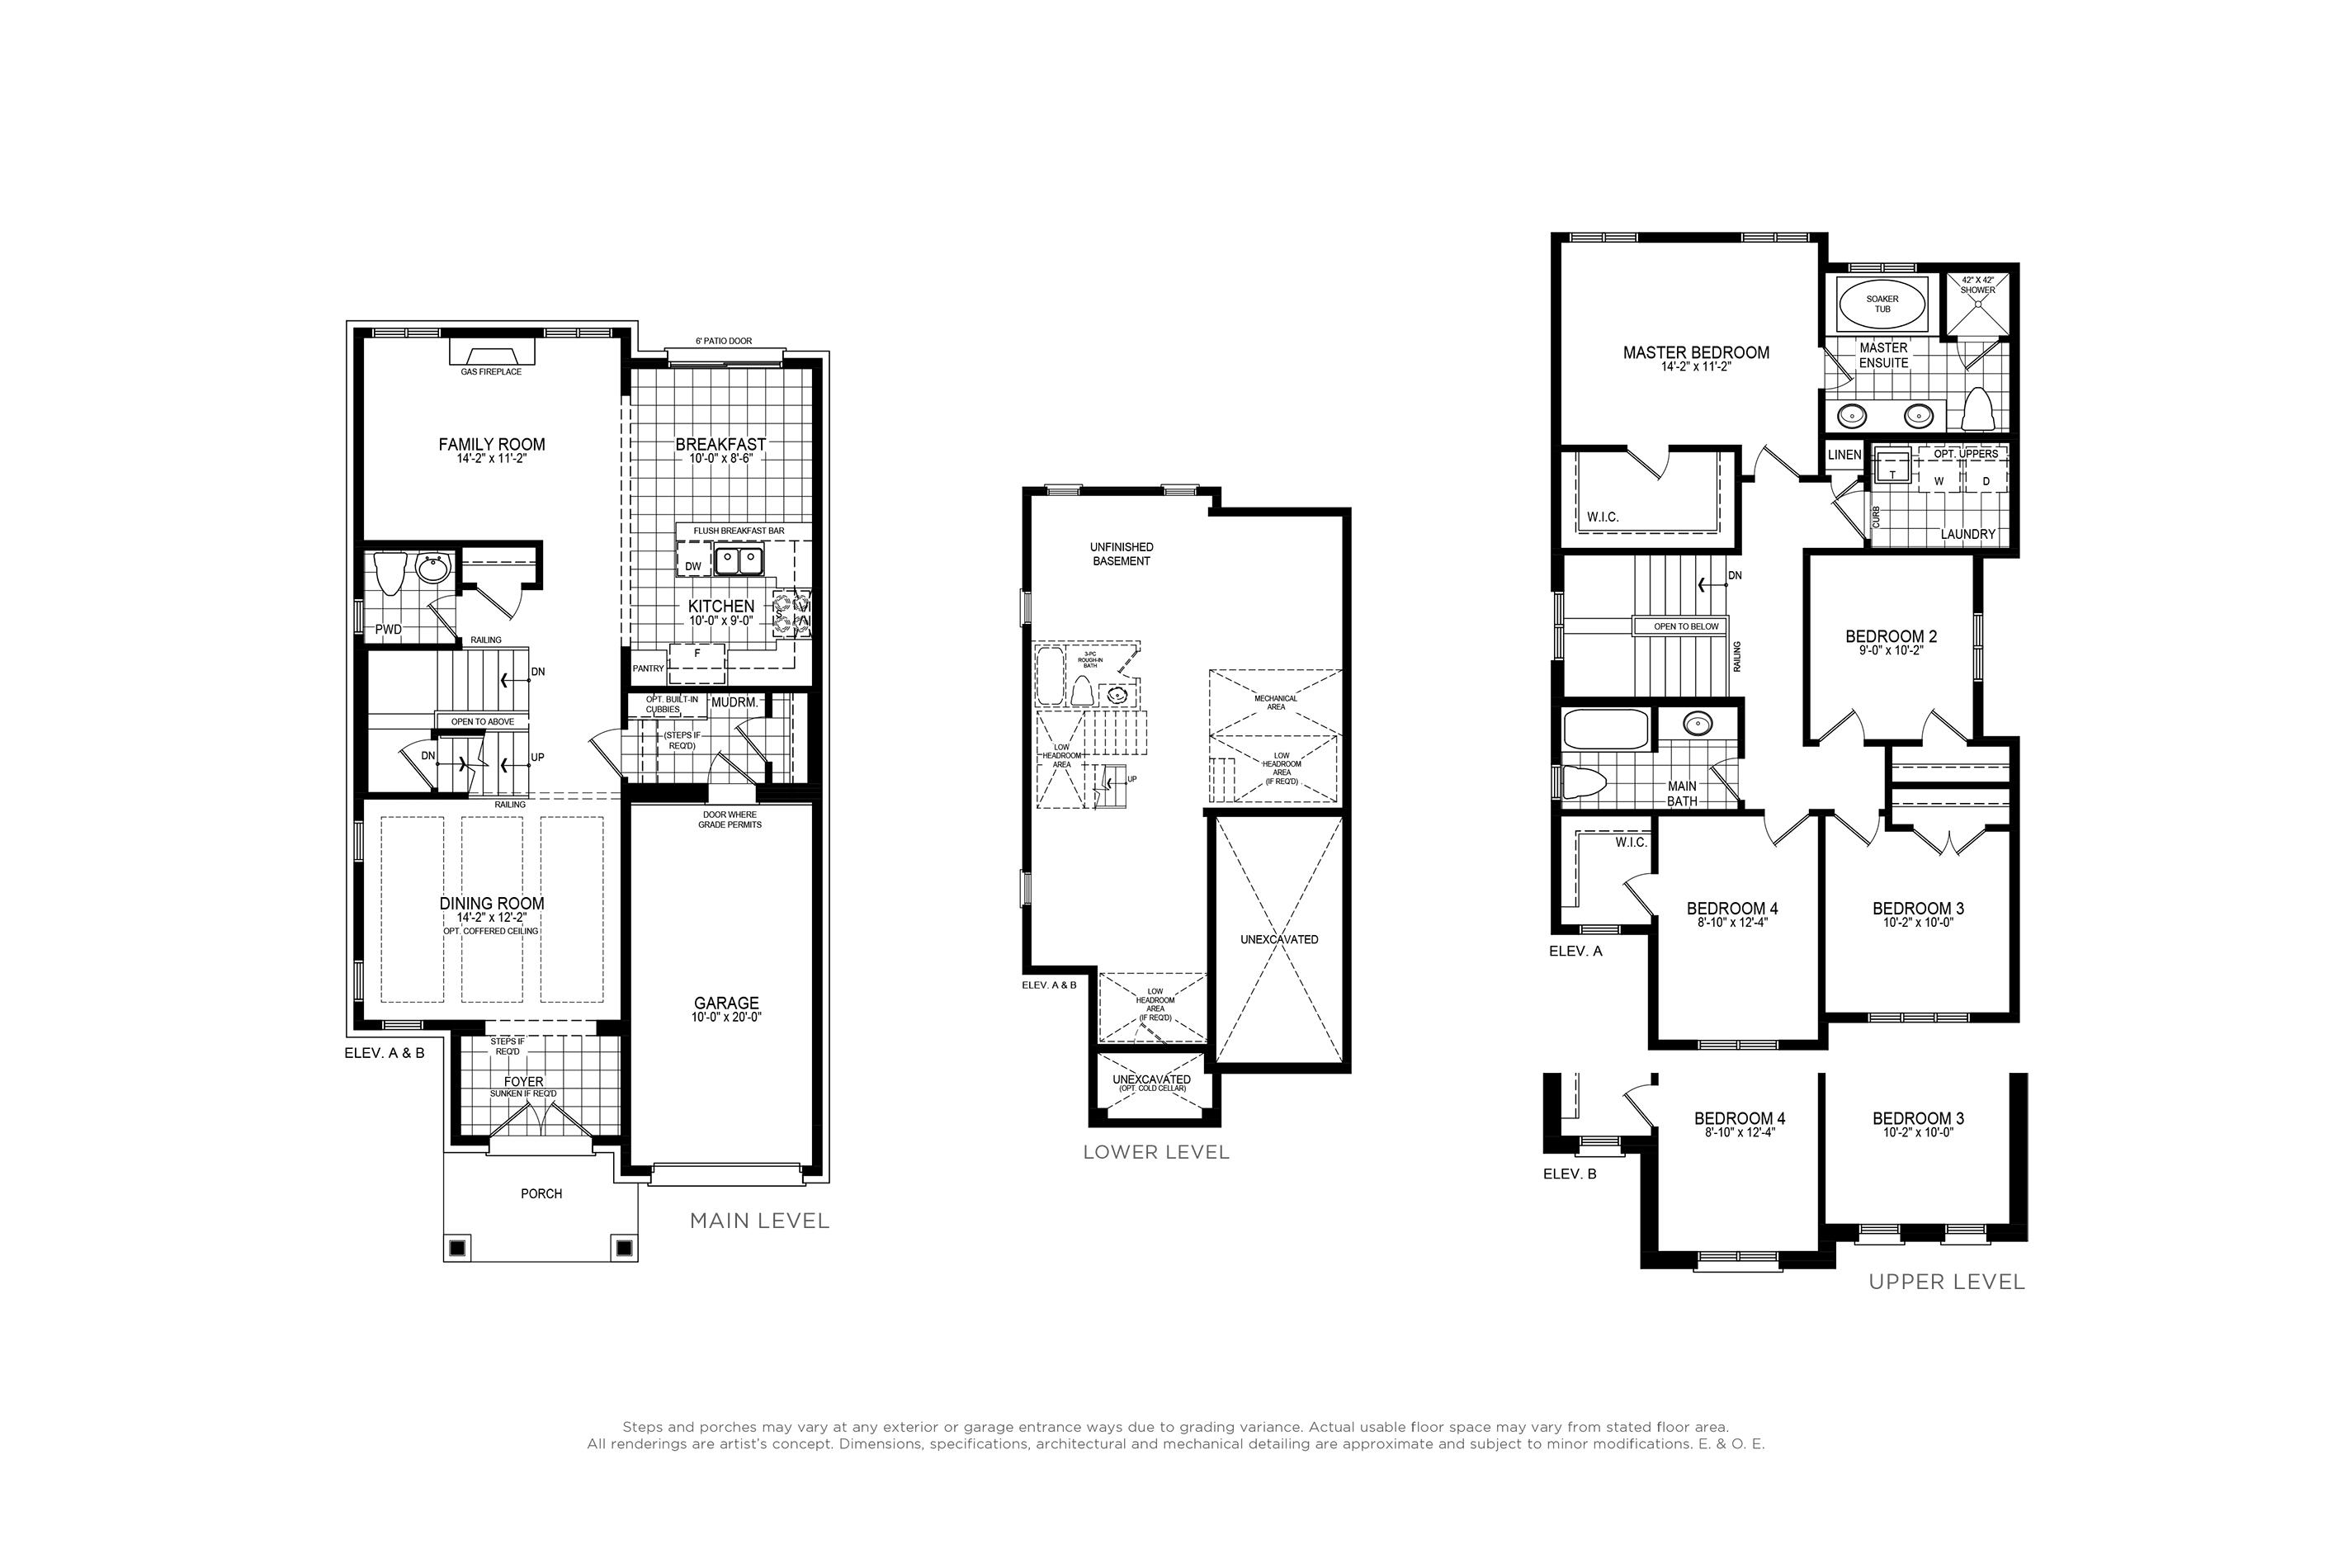 Brighton 1 Floorplan